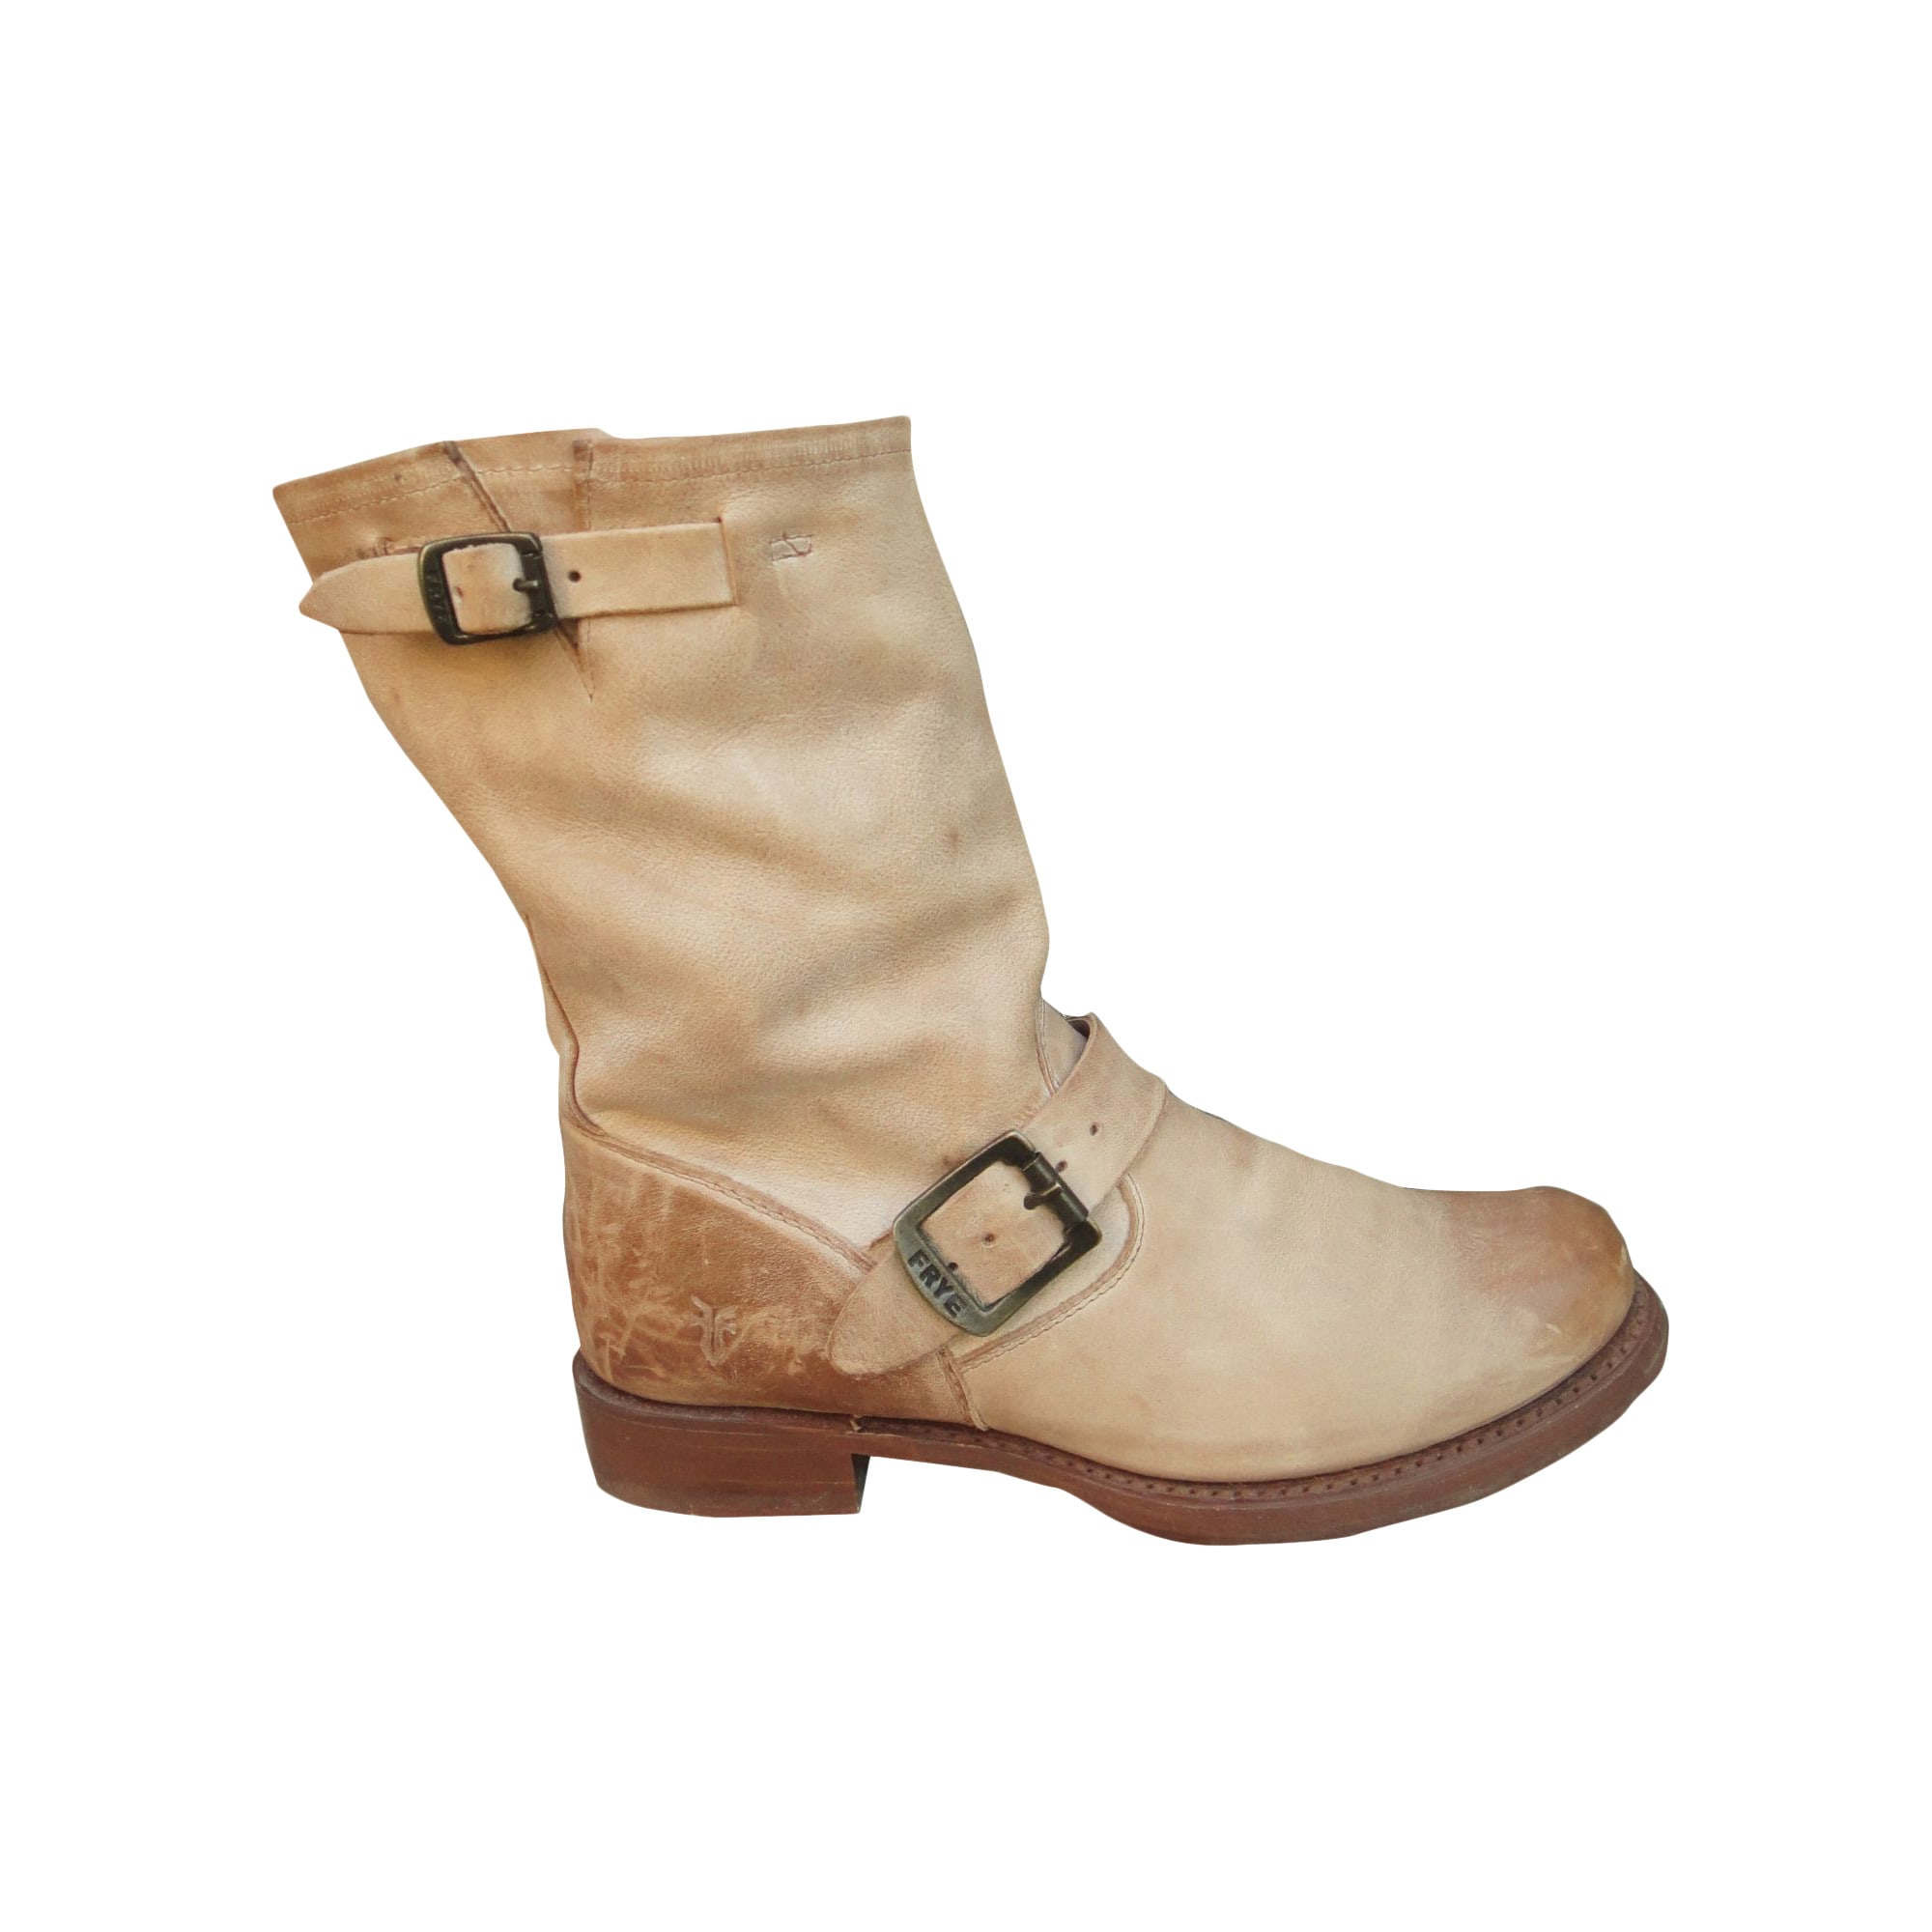 Bottines & low boots motards FRYE Beige, camel